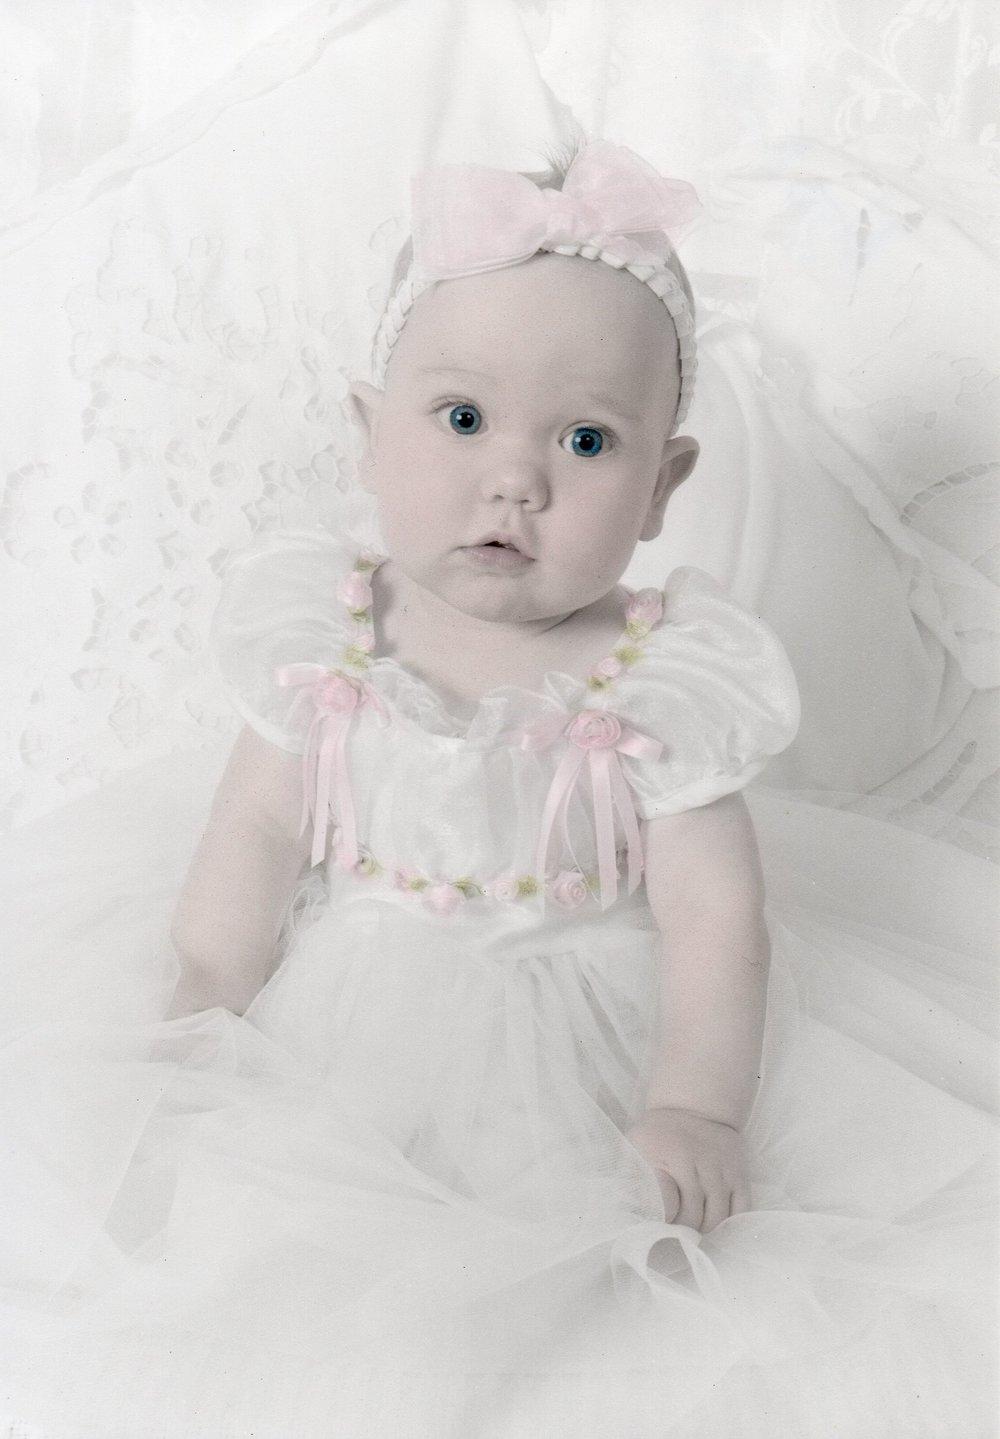 baby024.jpg